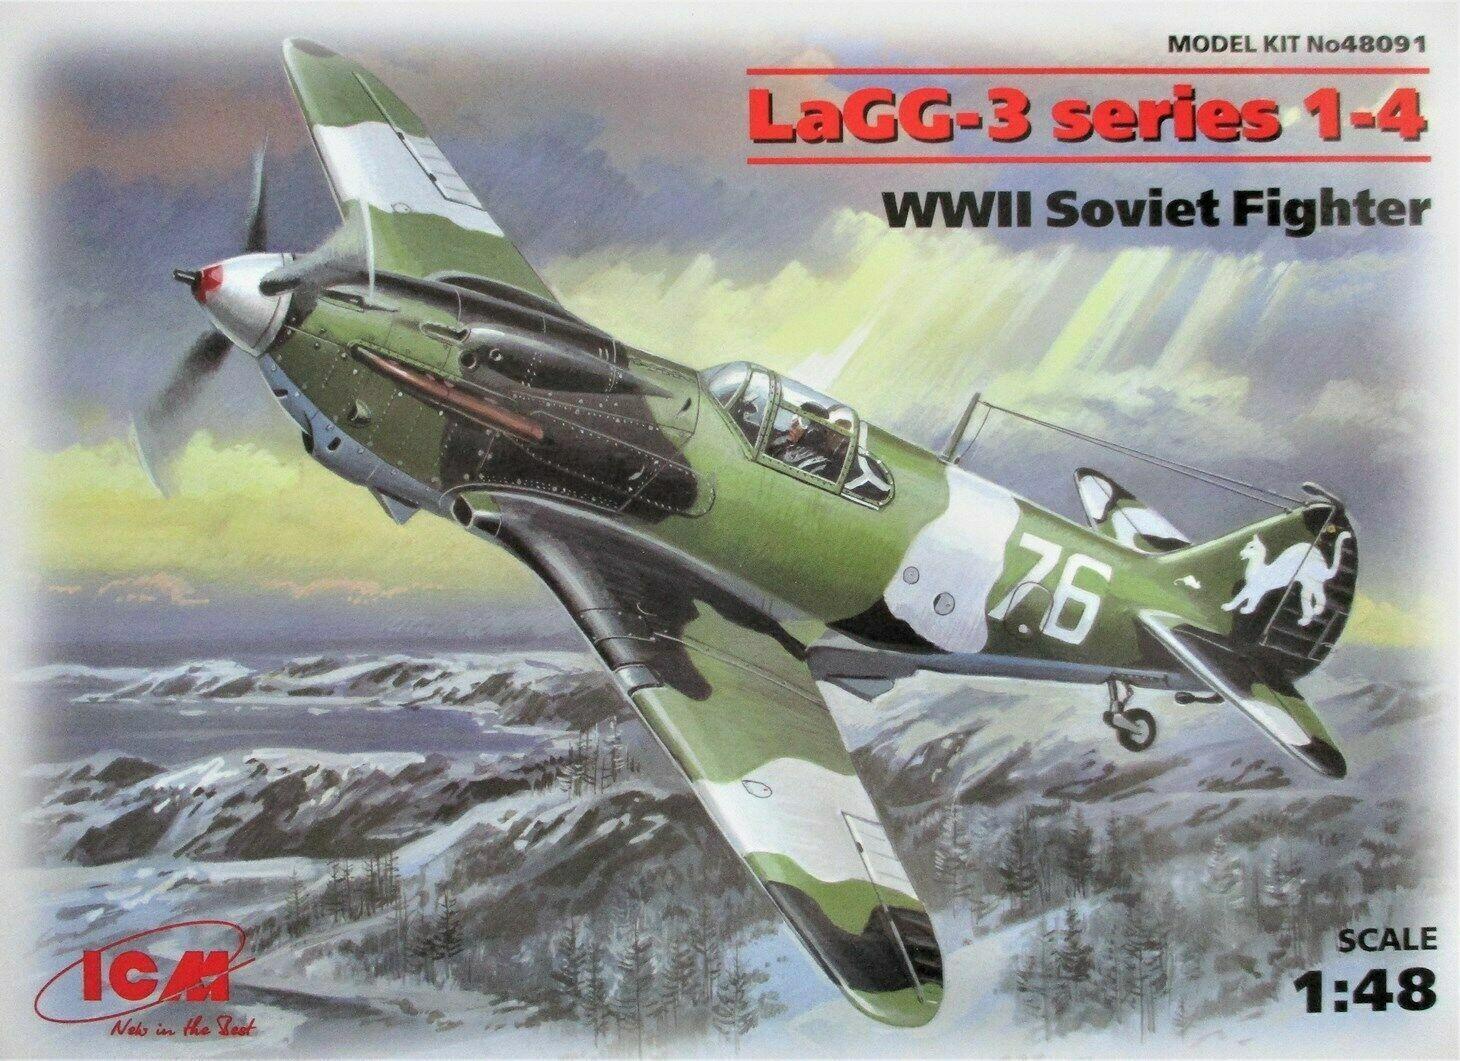 ICM 1//48 Maßstab Modell Set LaGG-3 Serie 1-4 WWII Sowjet Kampfflieger ICM48091